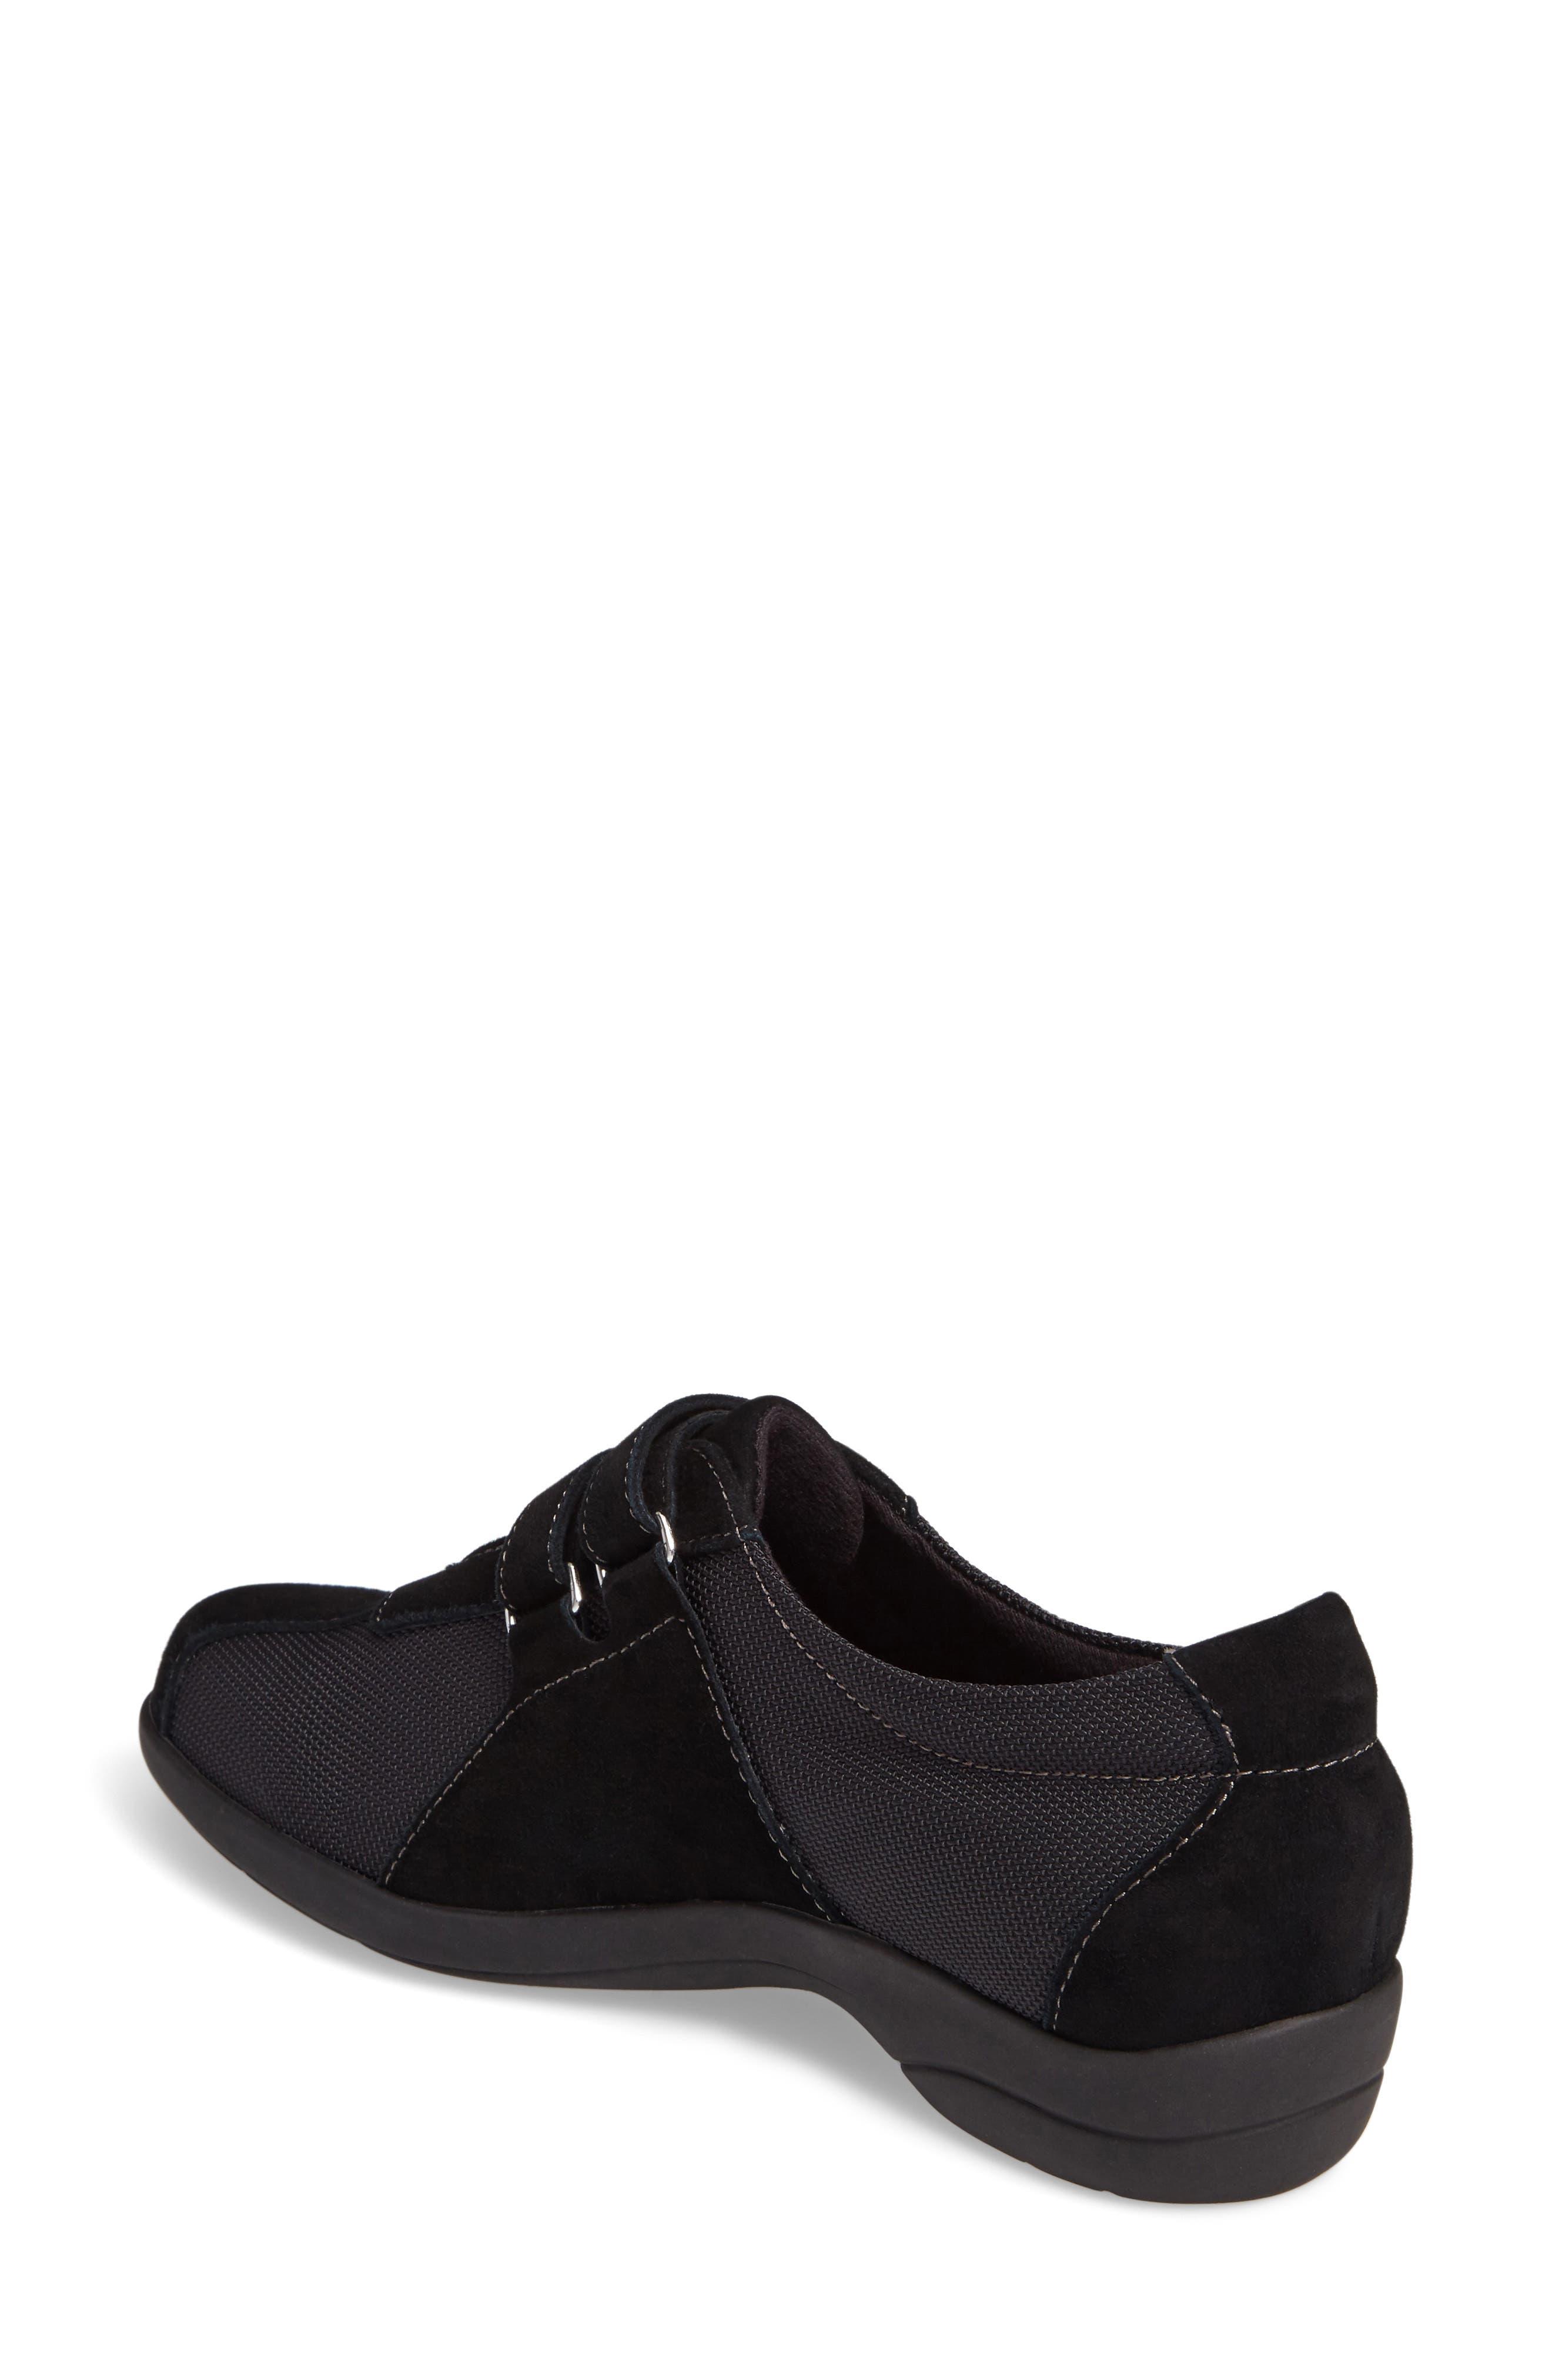 Joliet Sneaker,                             Alternate thumbnail 2, color,                             BLACK FABRIC